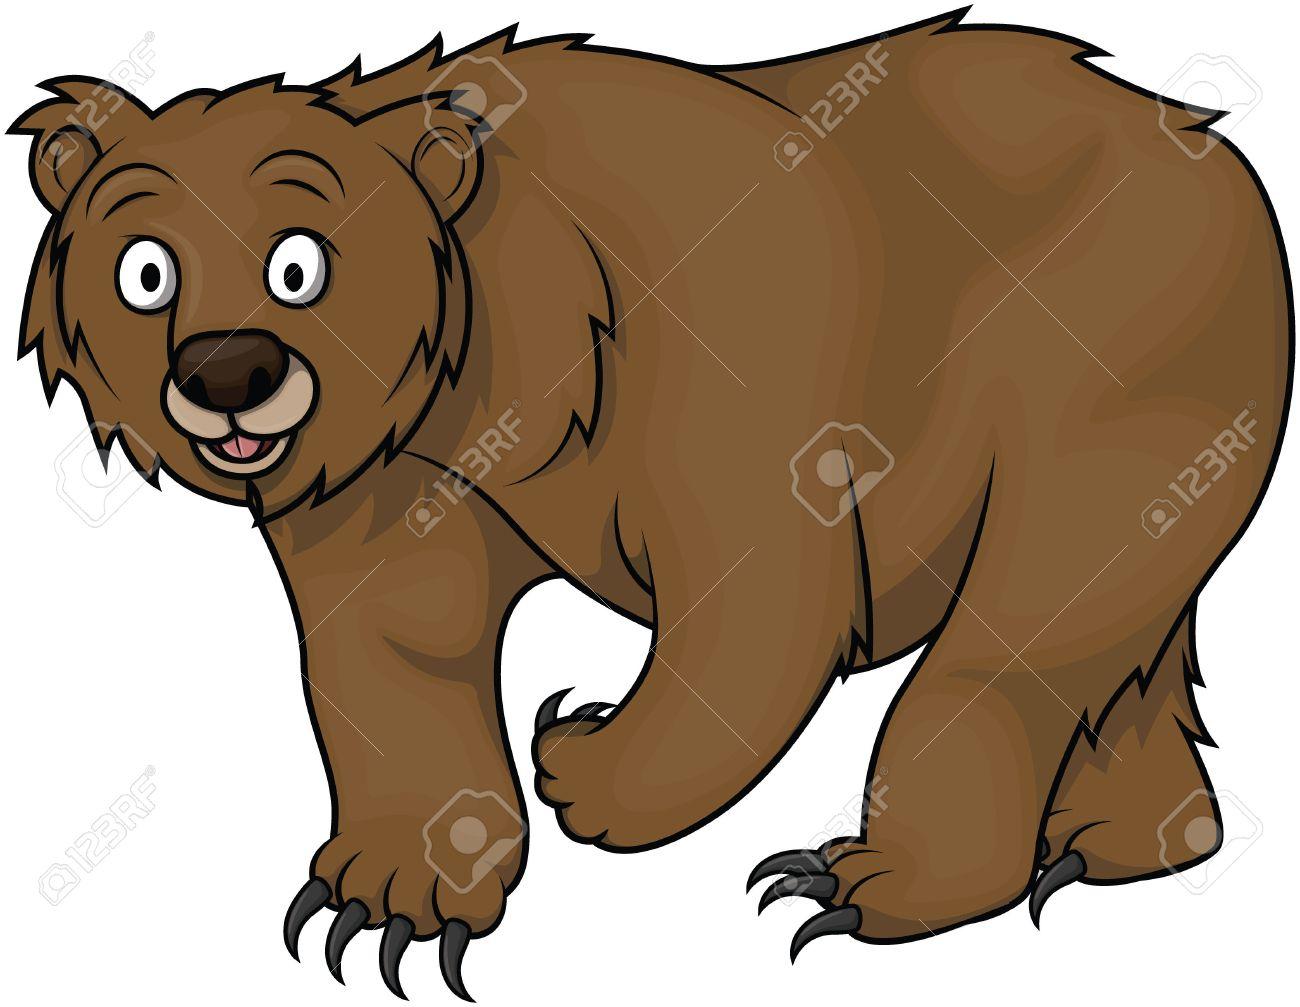 bear cartoon illustration royalty free cliparts vectors and stock rh 123rf com cartoon teddy bear pictures funny cartoon bear pictures